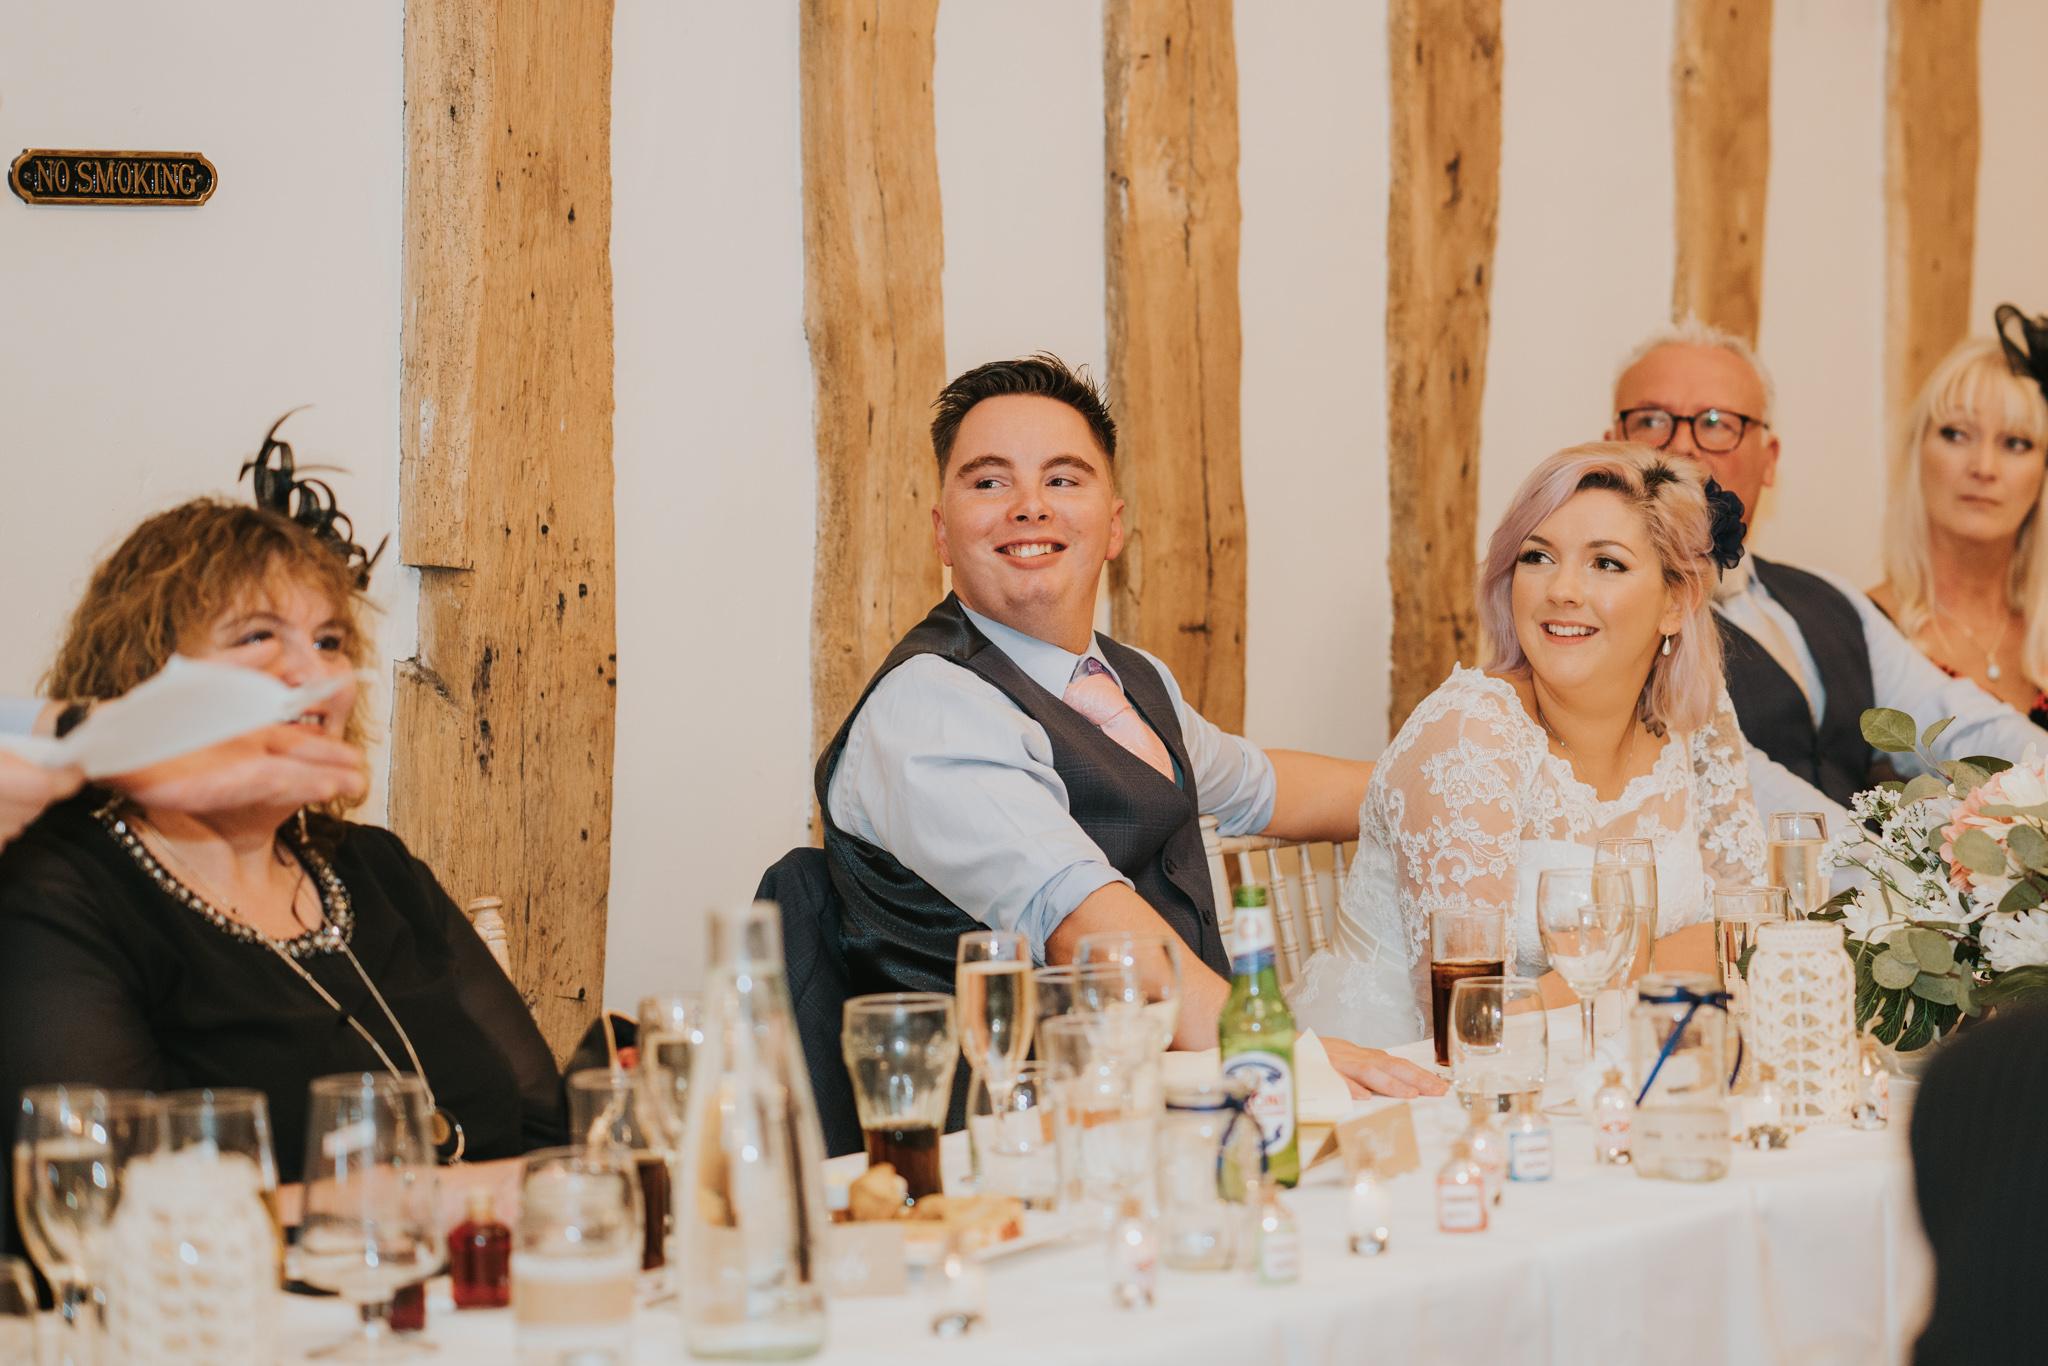 rhia-james-rustic-crabbs-barn-vintage-50s-retro-wedding-grace-elizabeth-colchester-essex-alternative-relaxed-wedding-family-photography-devon-suffolk-norfolk-essex (125 of 138).jpg